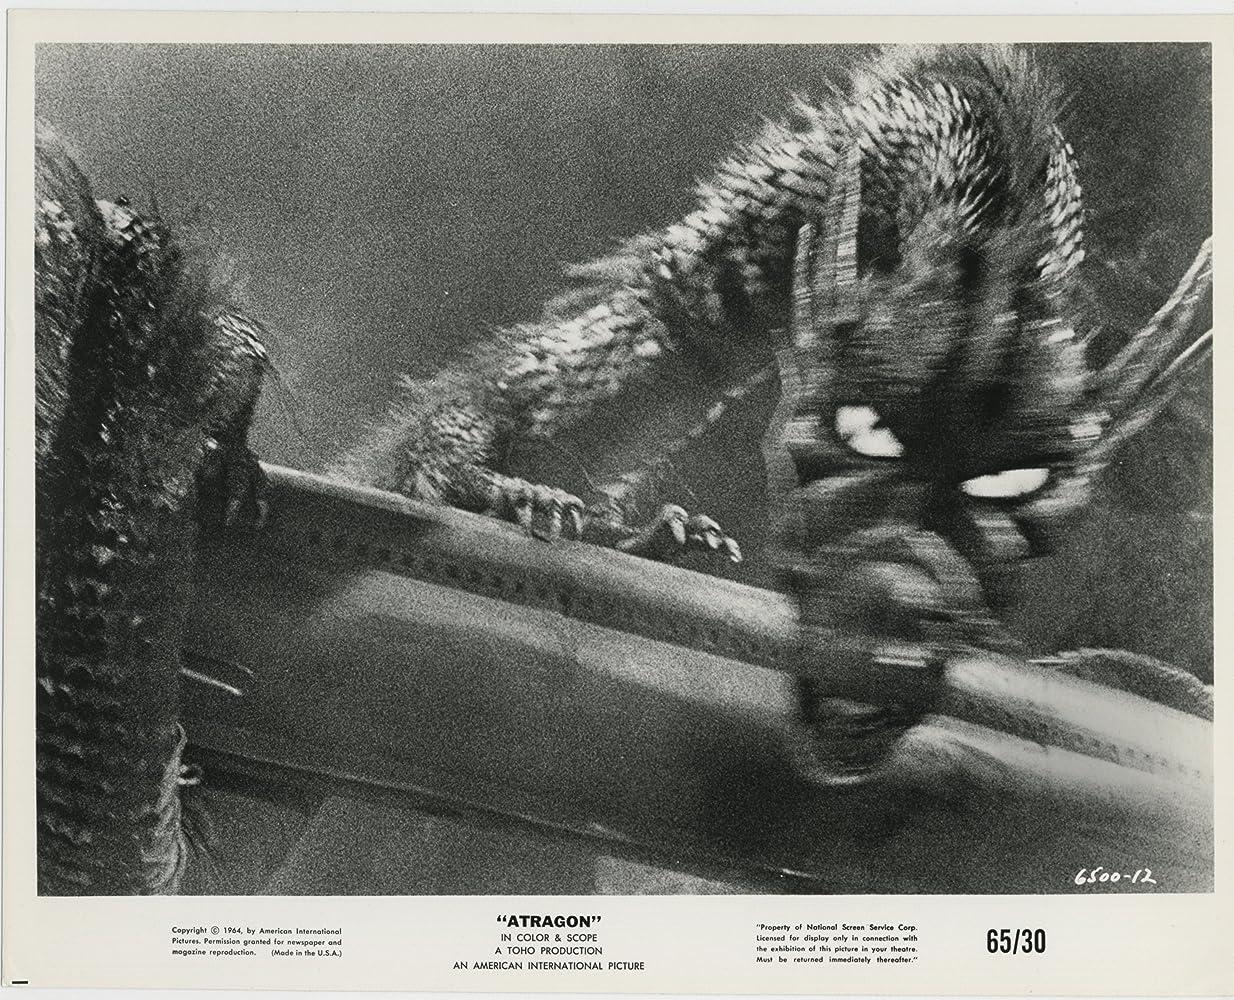 L'immancabile mostro gigantesco